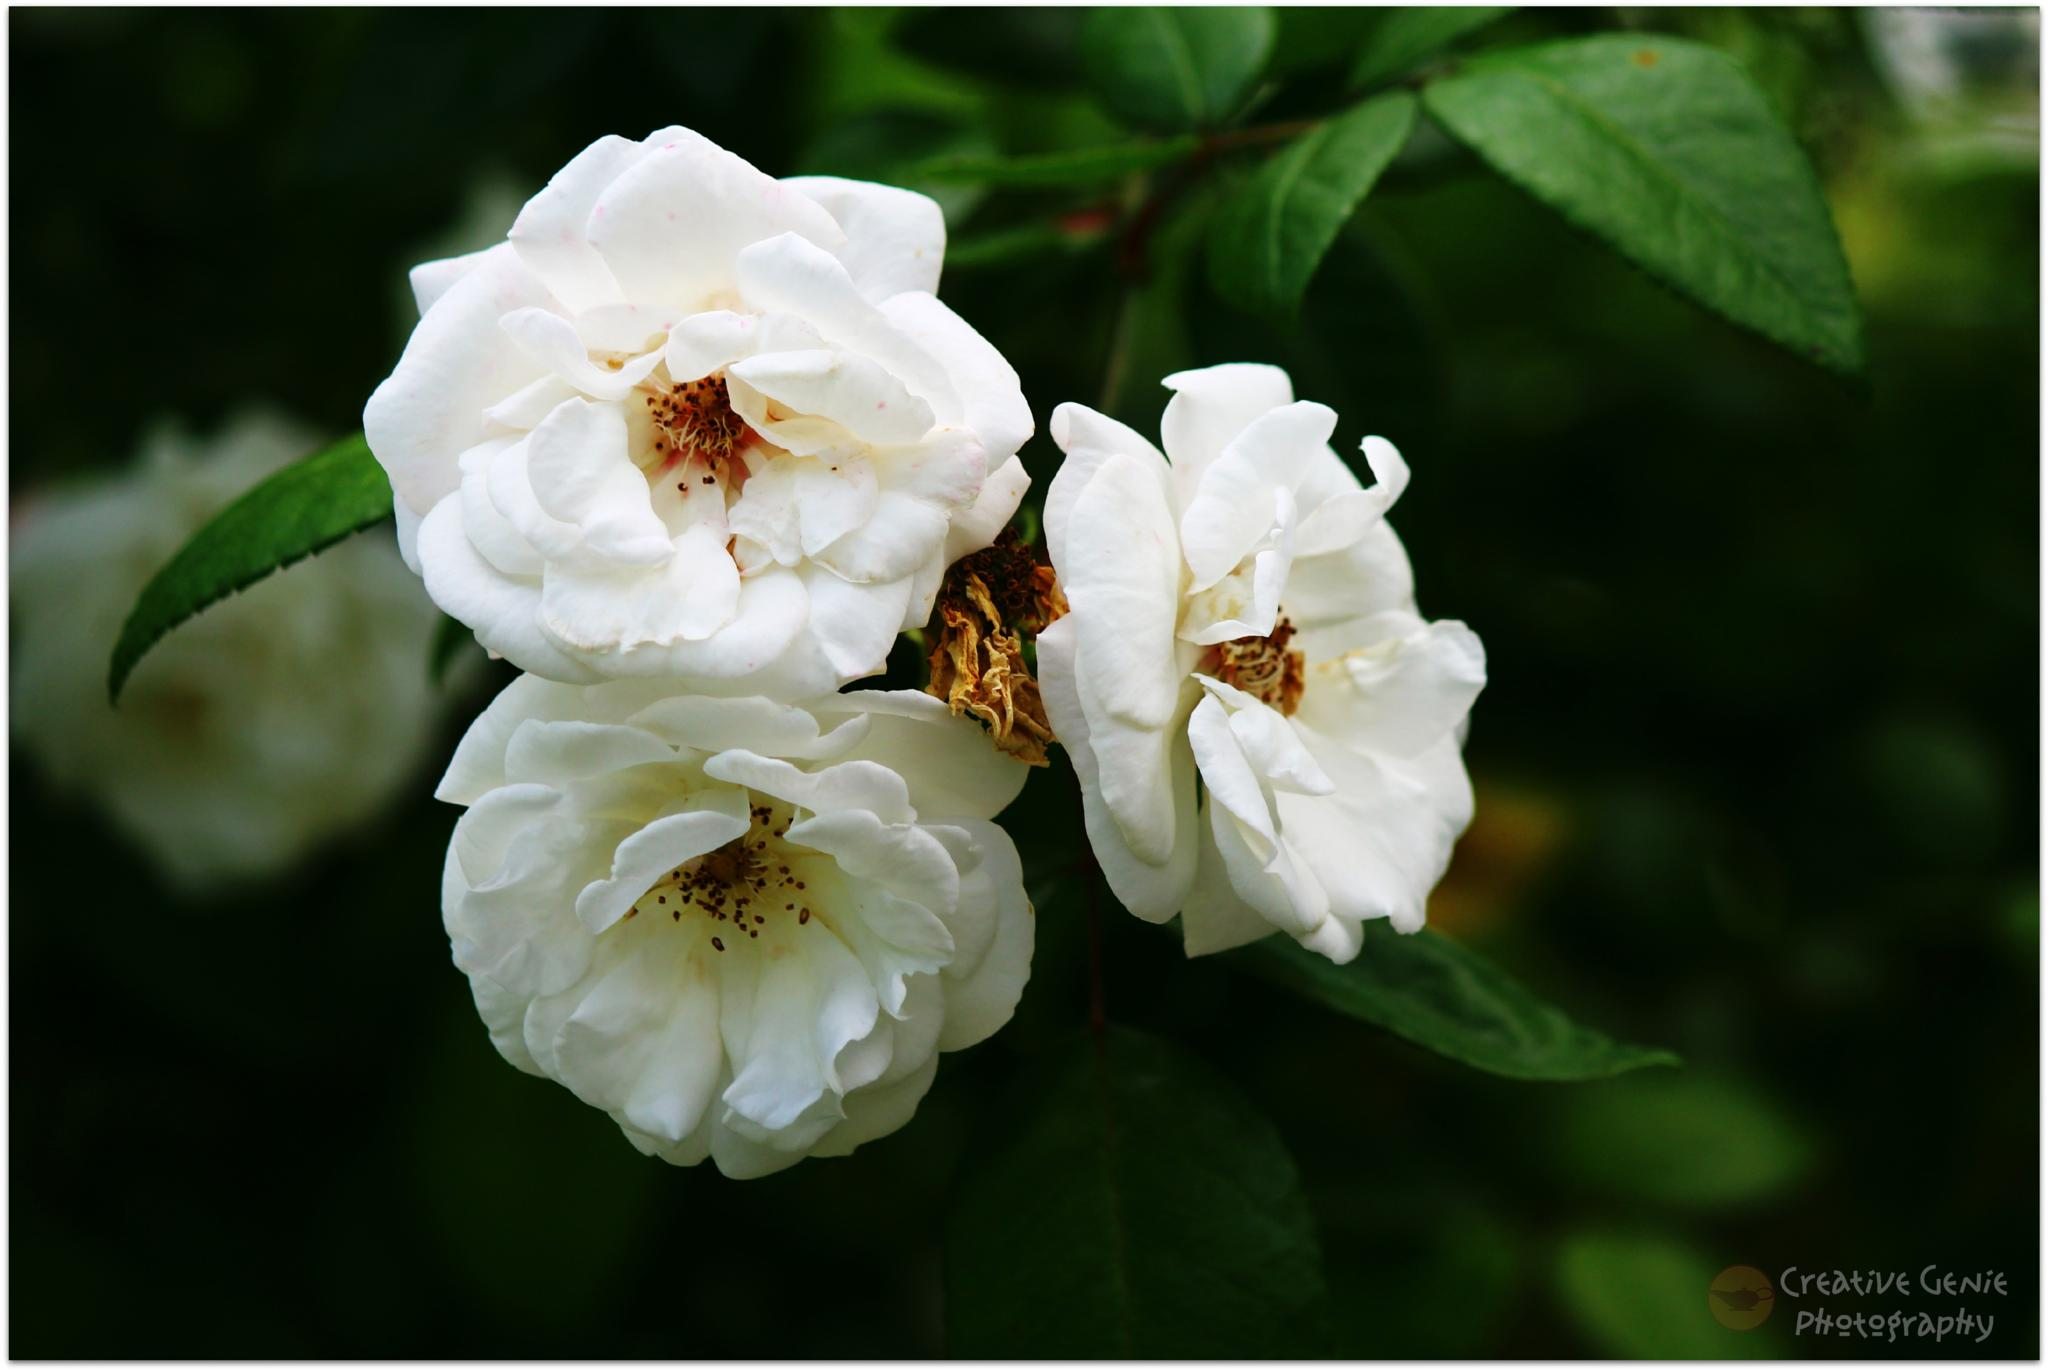 Juanita the Rose Bush by Creative Genie Photography